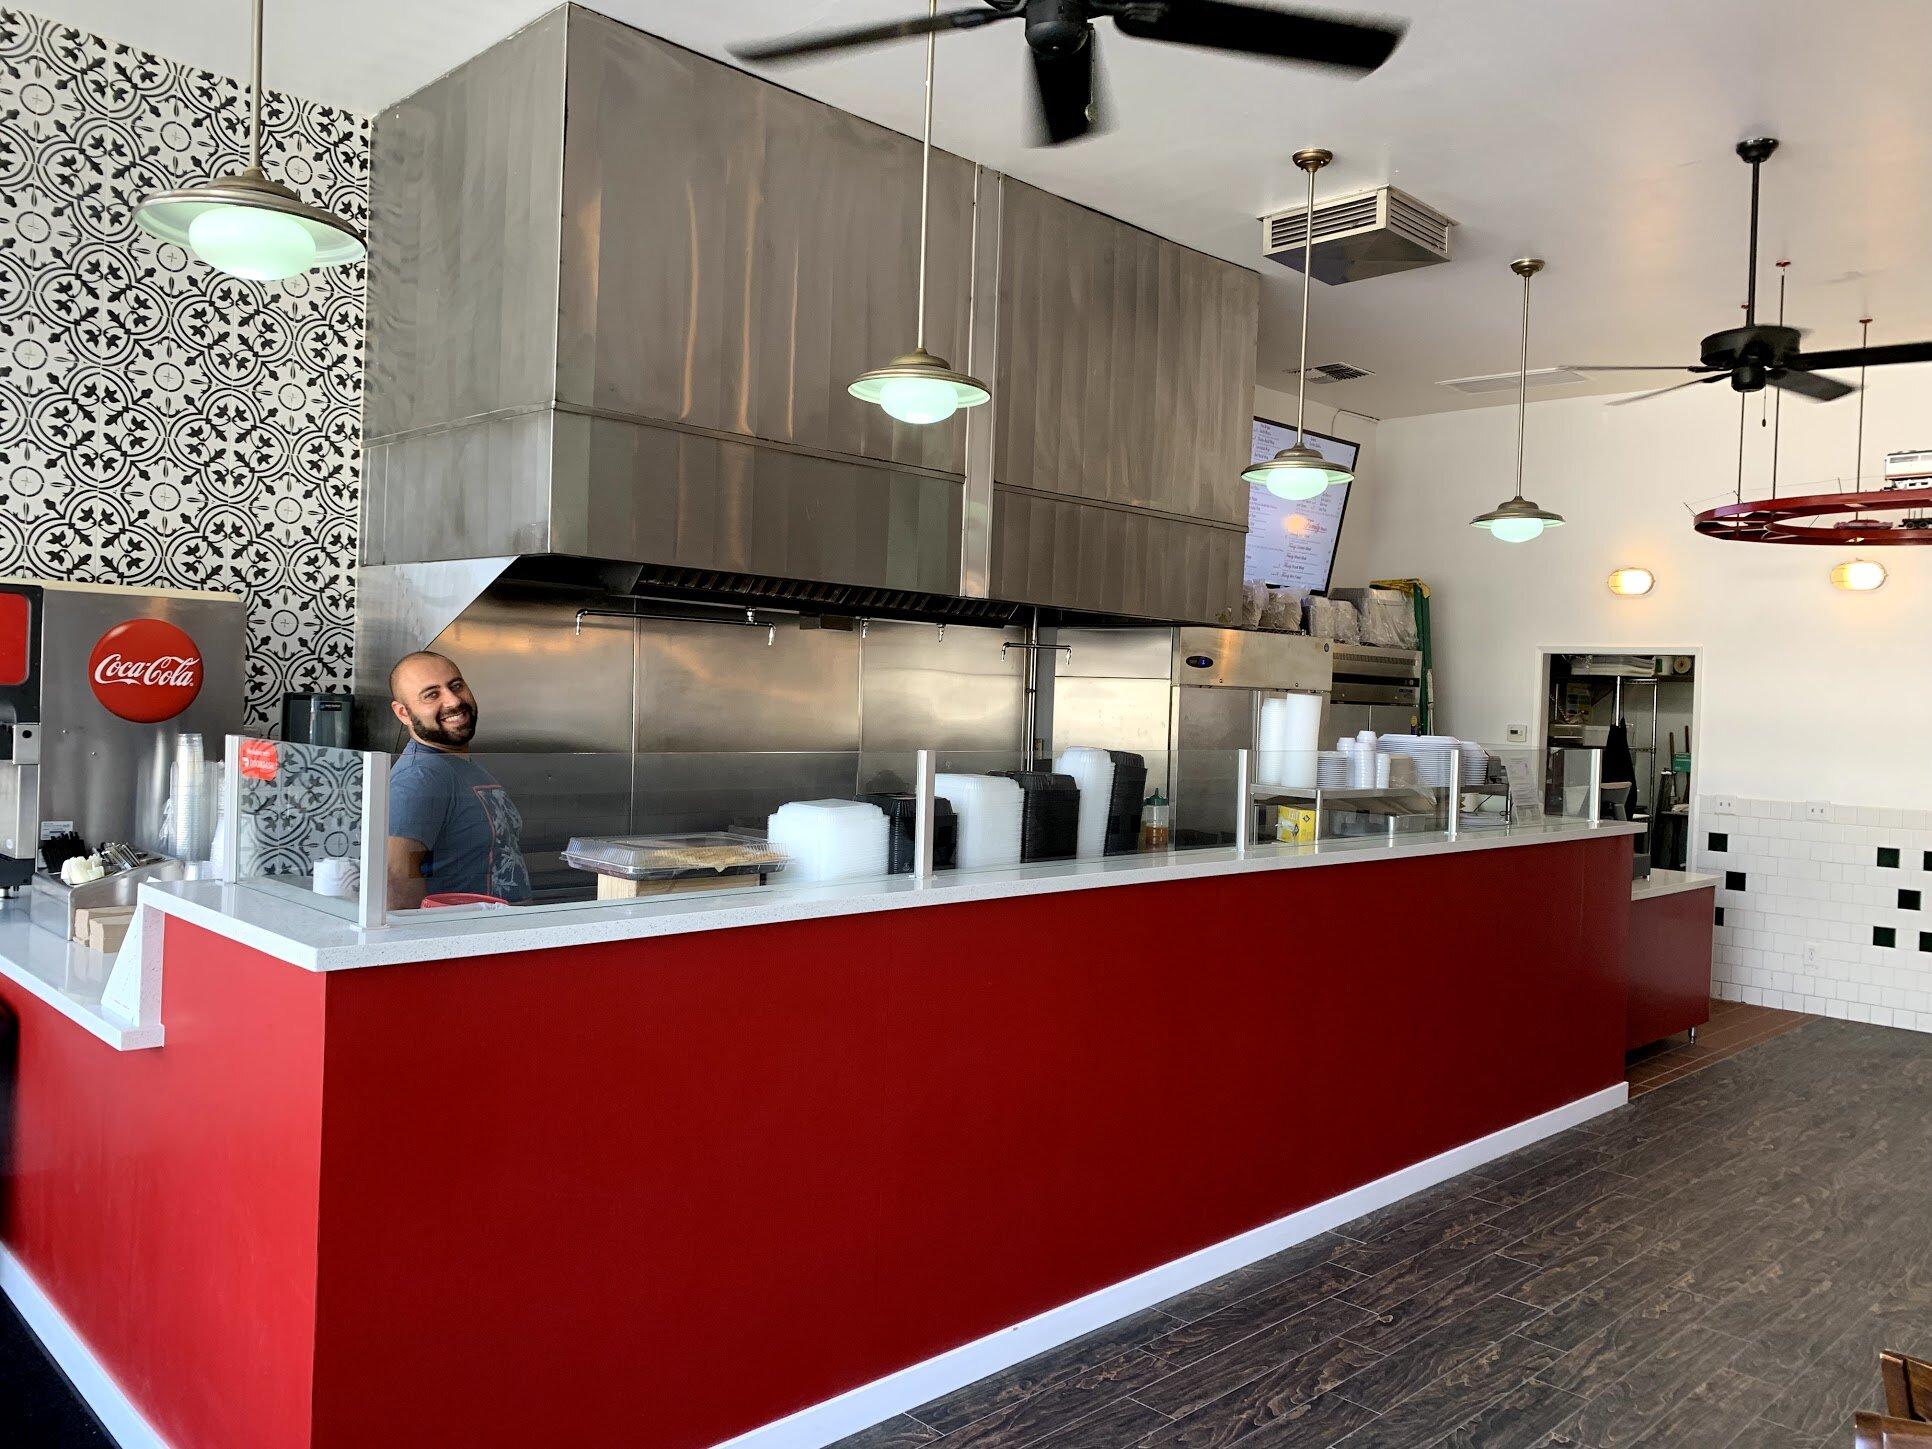 La Canada Flintridge(Soft Opening) - CAFE X2O456 Foothill Blvd.La Canada Flintridge, California(818) 928-1395